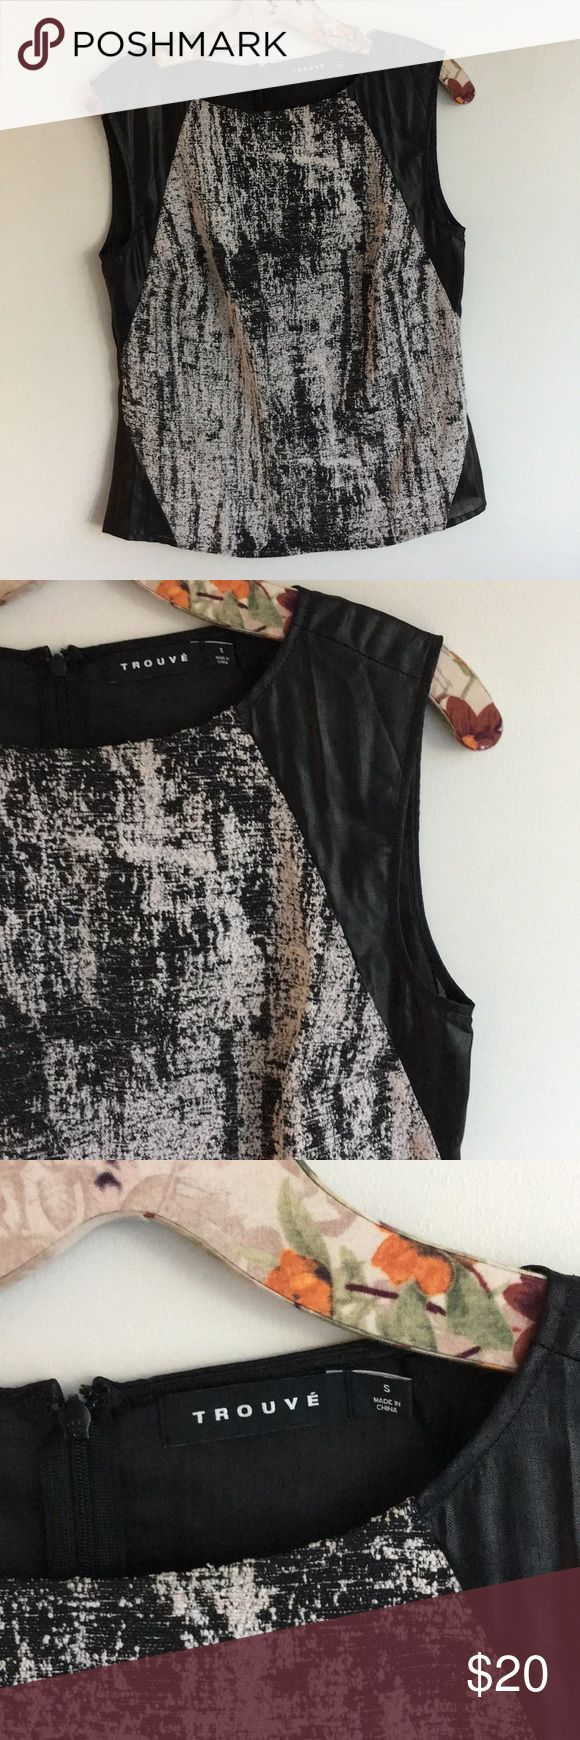 Trouble black snake print blouse Perfect condition💕 Trouve Tops Blouses